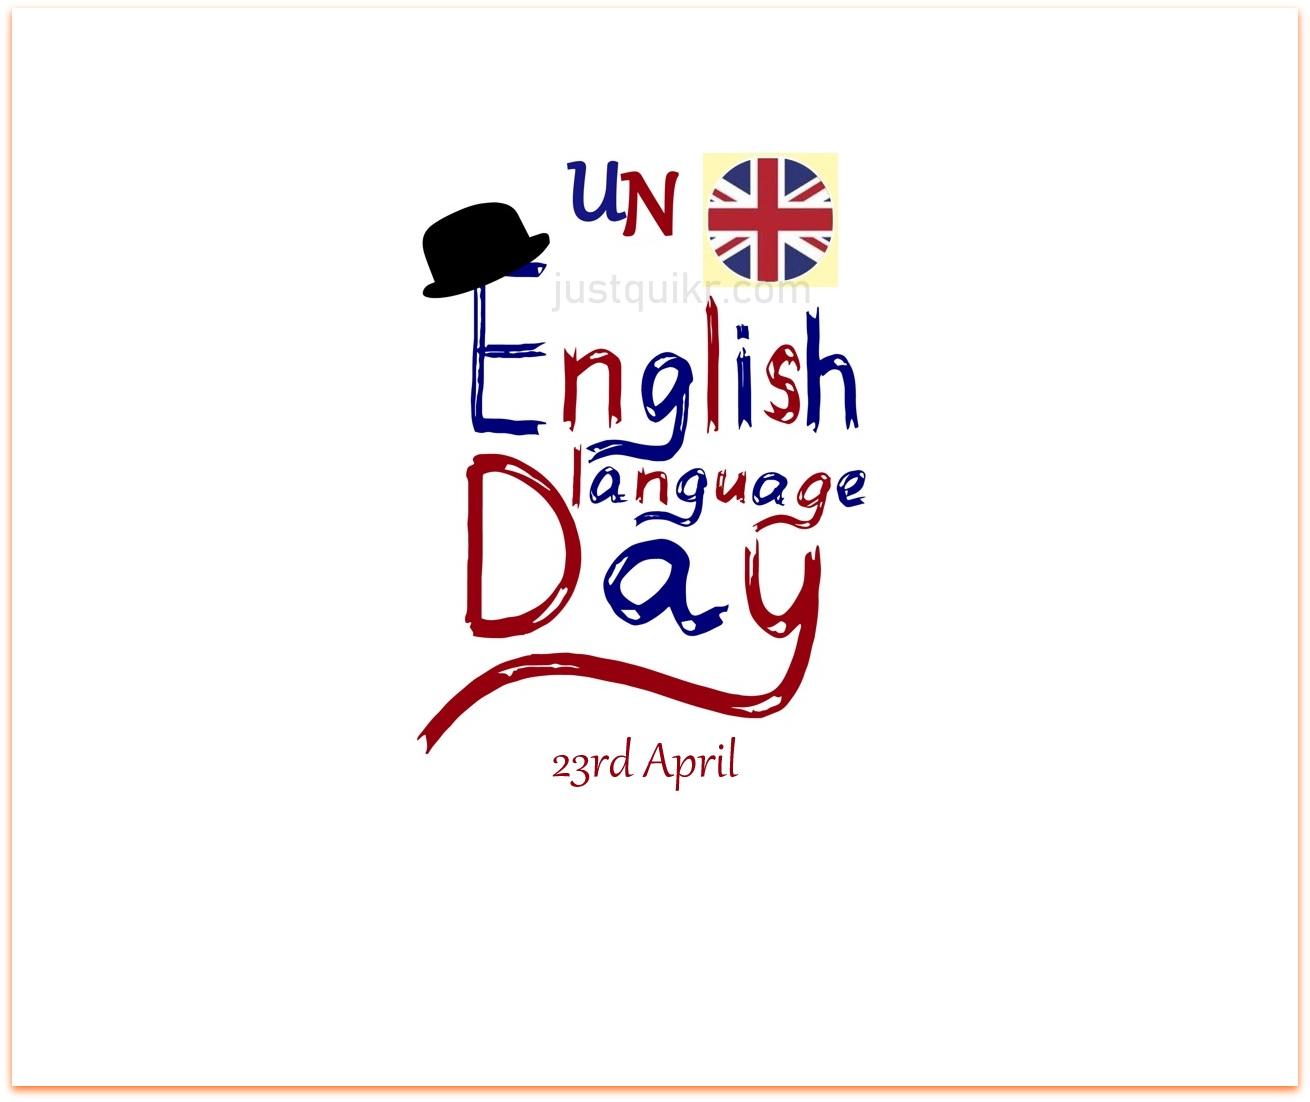 UN English Language Day